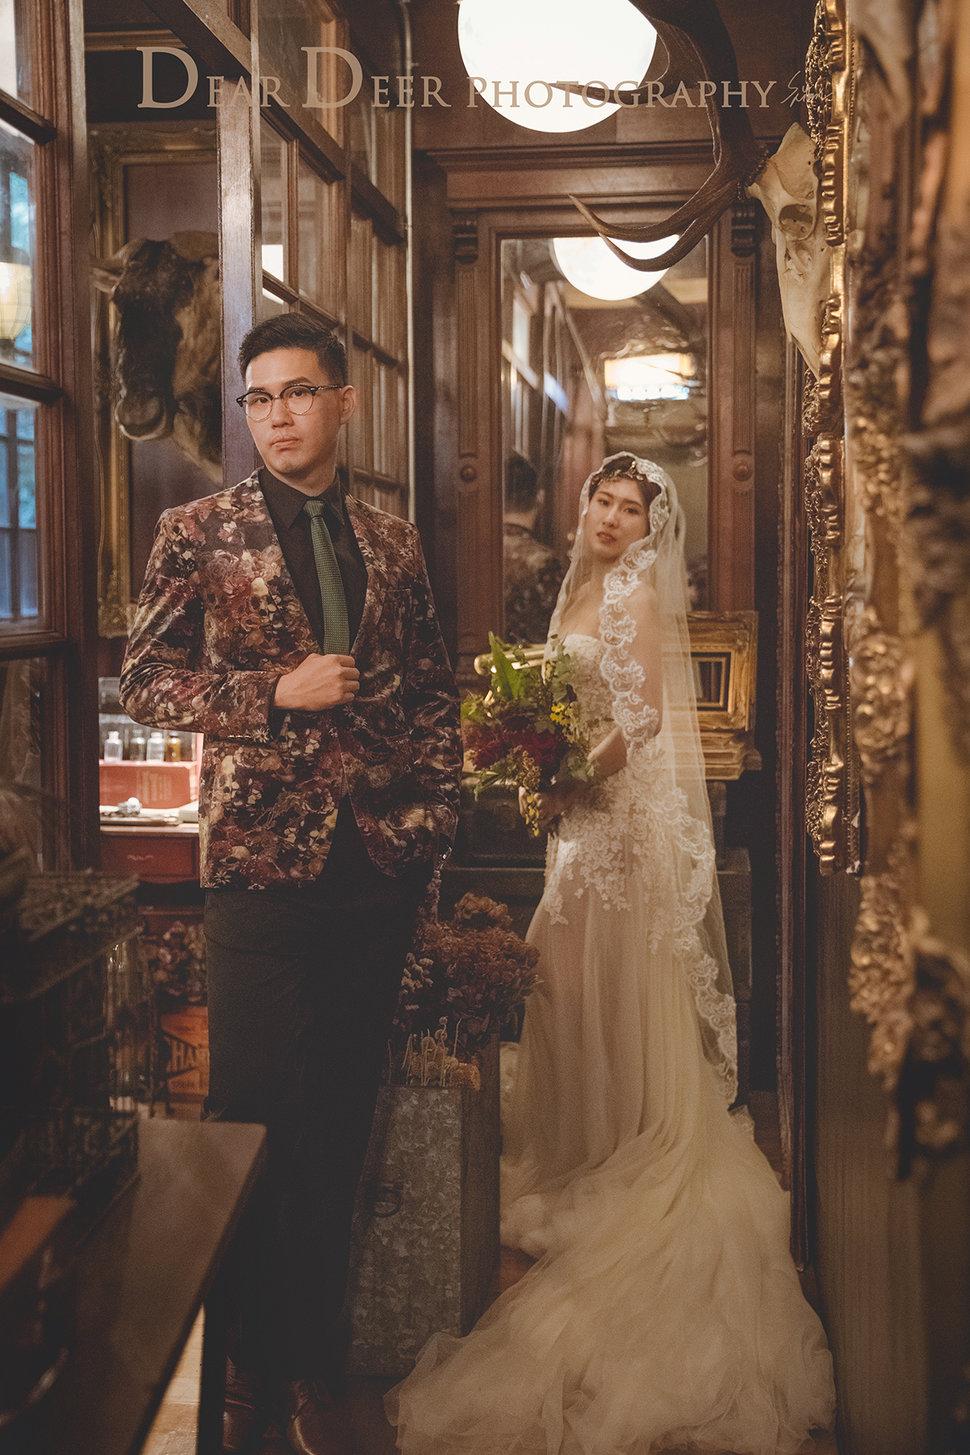 Dear Deer|電影劇照風格(編號:2843682) - Dear Deer鹿兒攝影|女攝影師蘇蔓 - 結婚吧